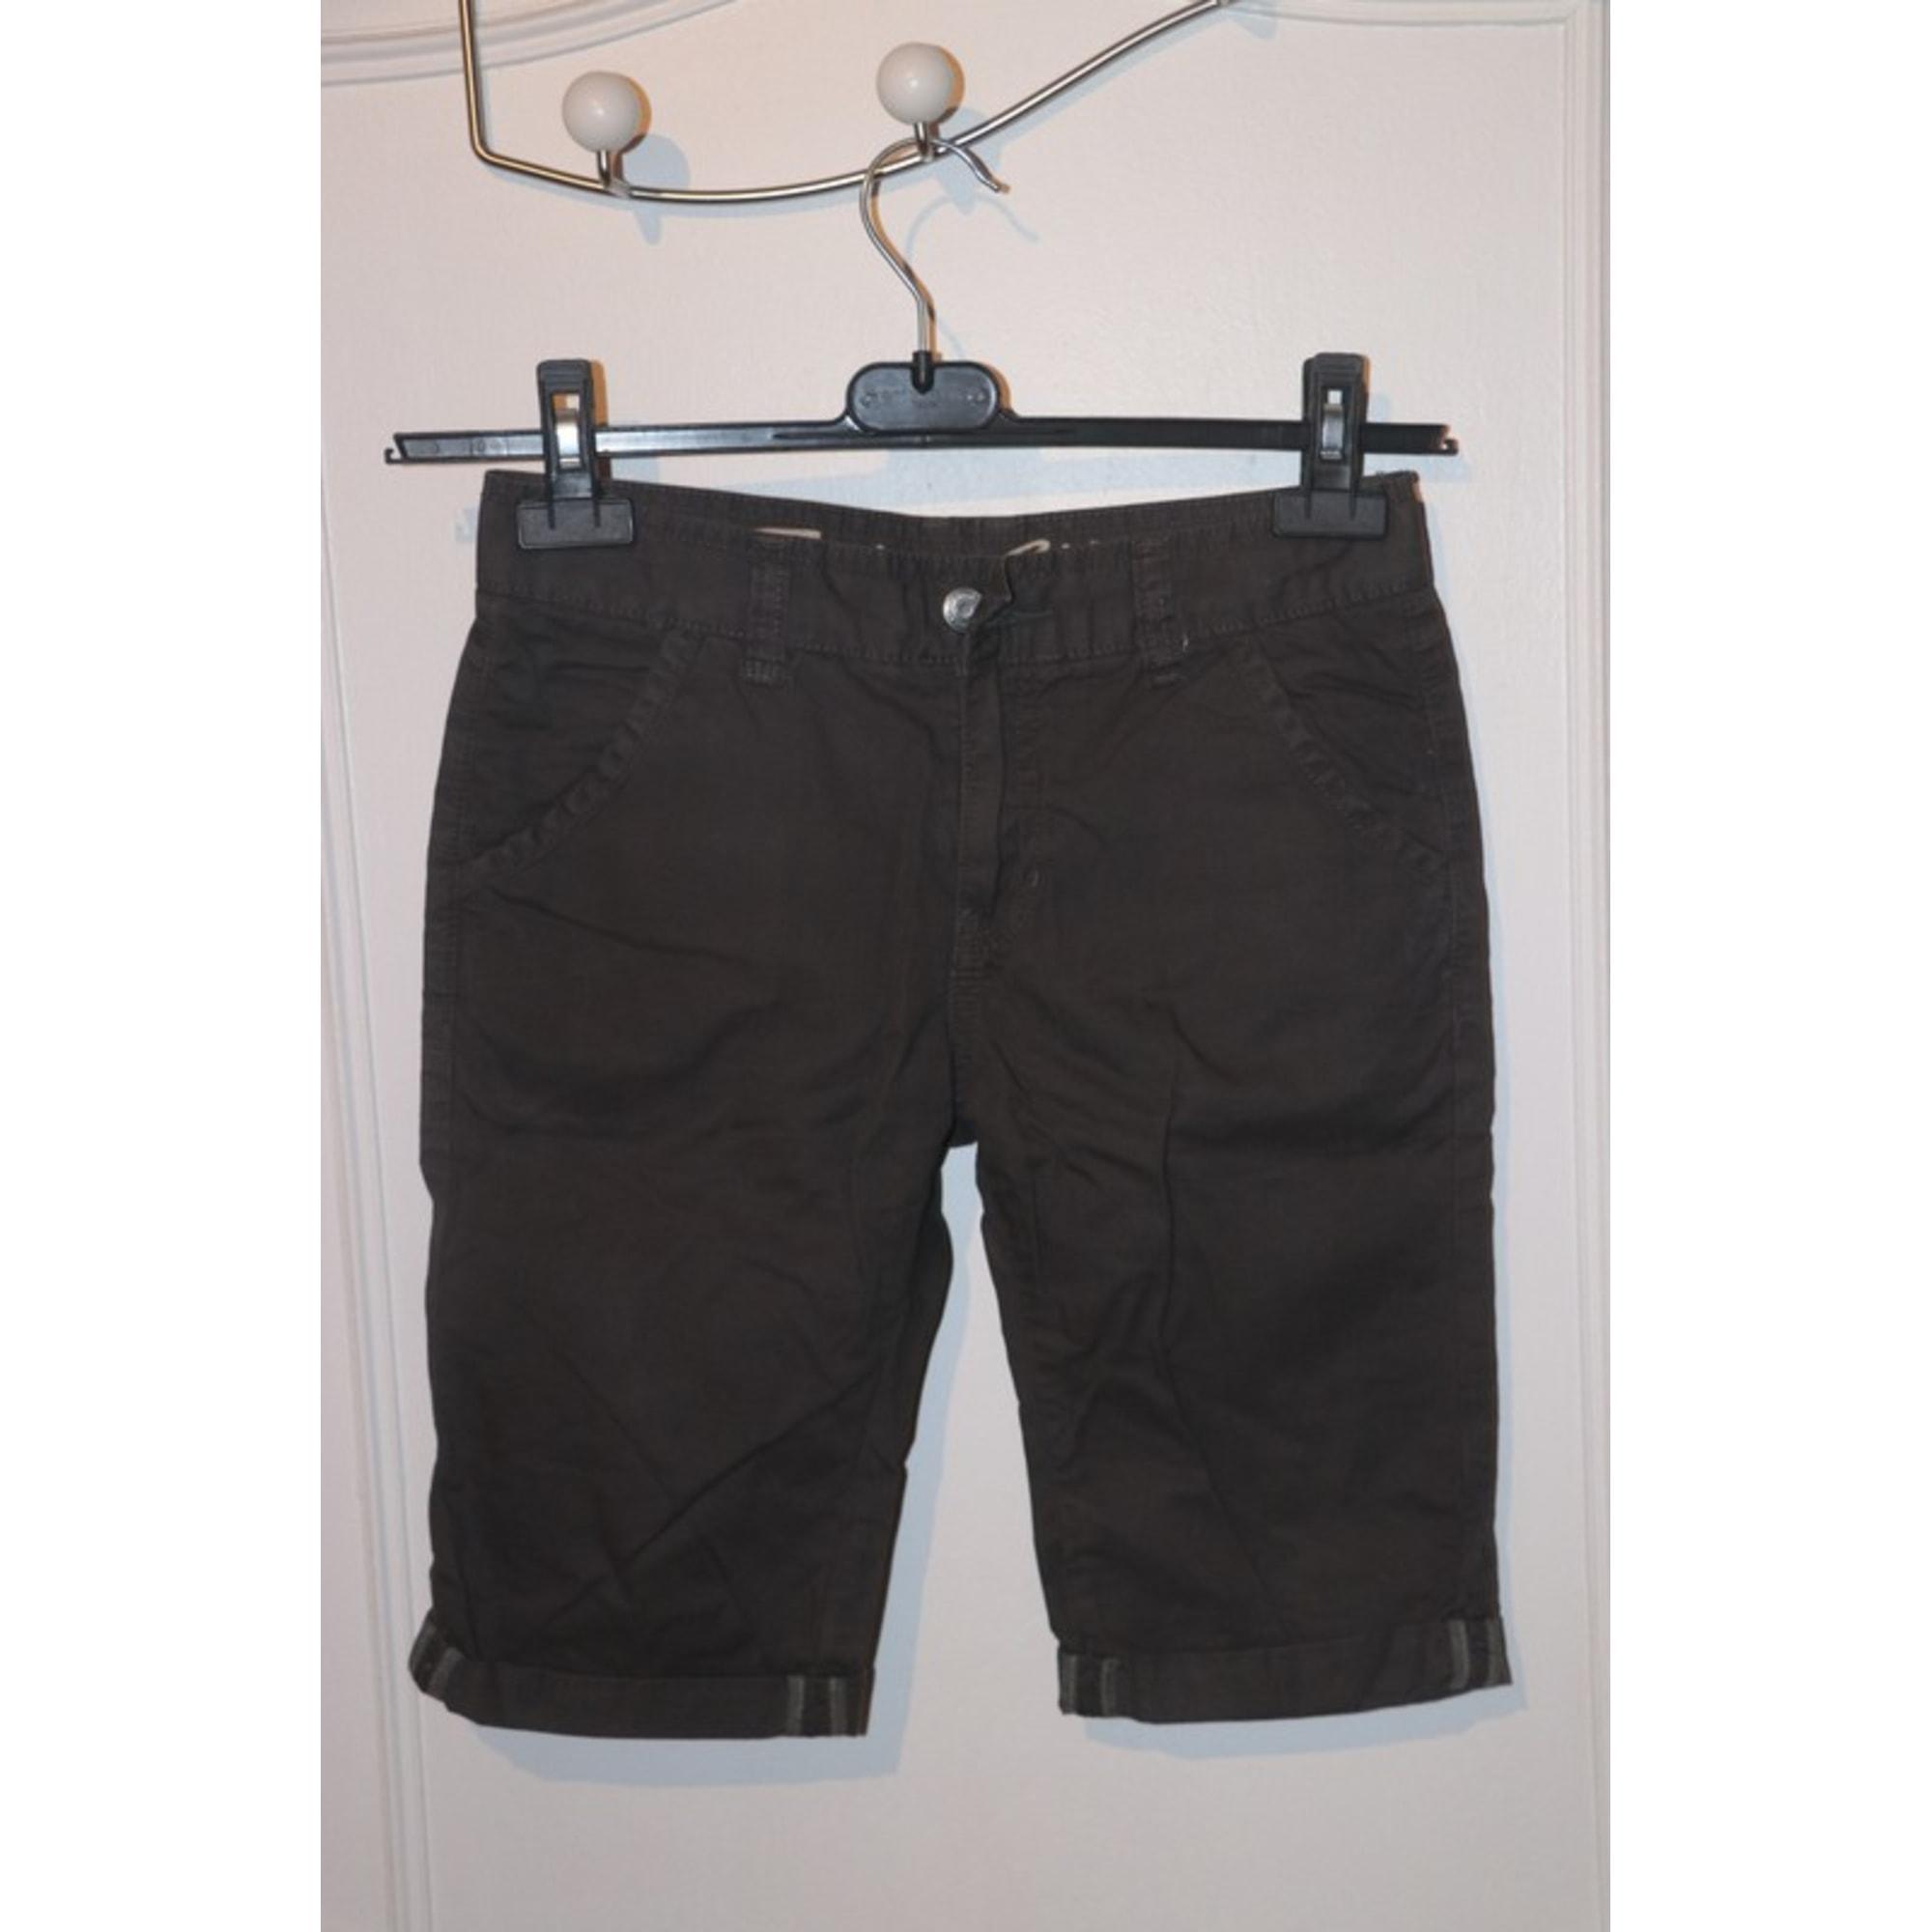 Shorts GÉMO Gray, charcoal